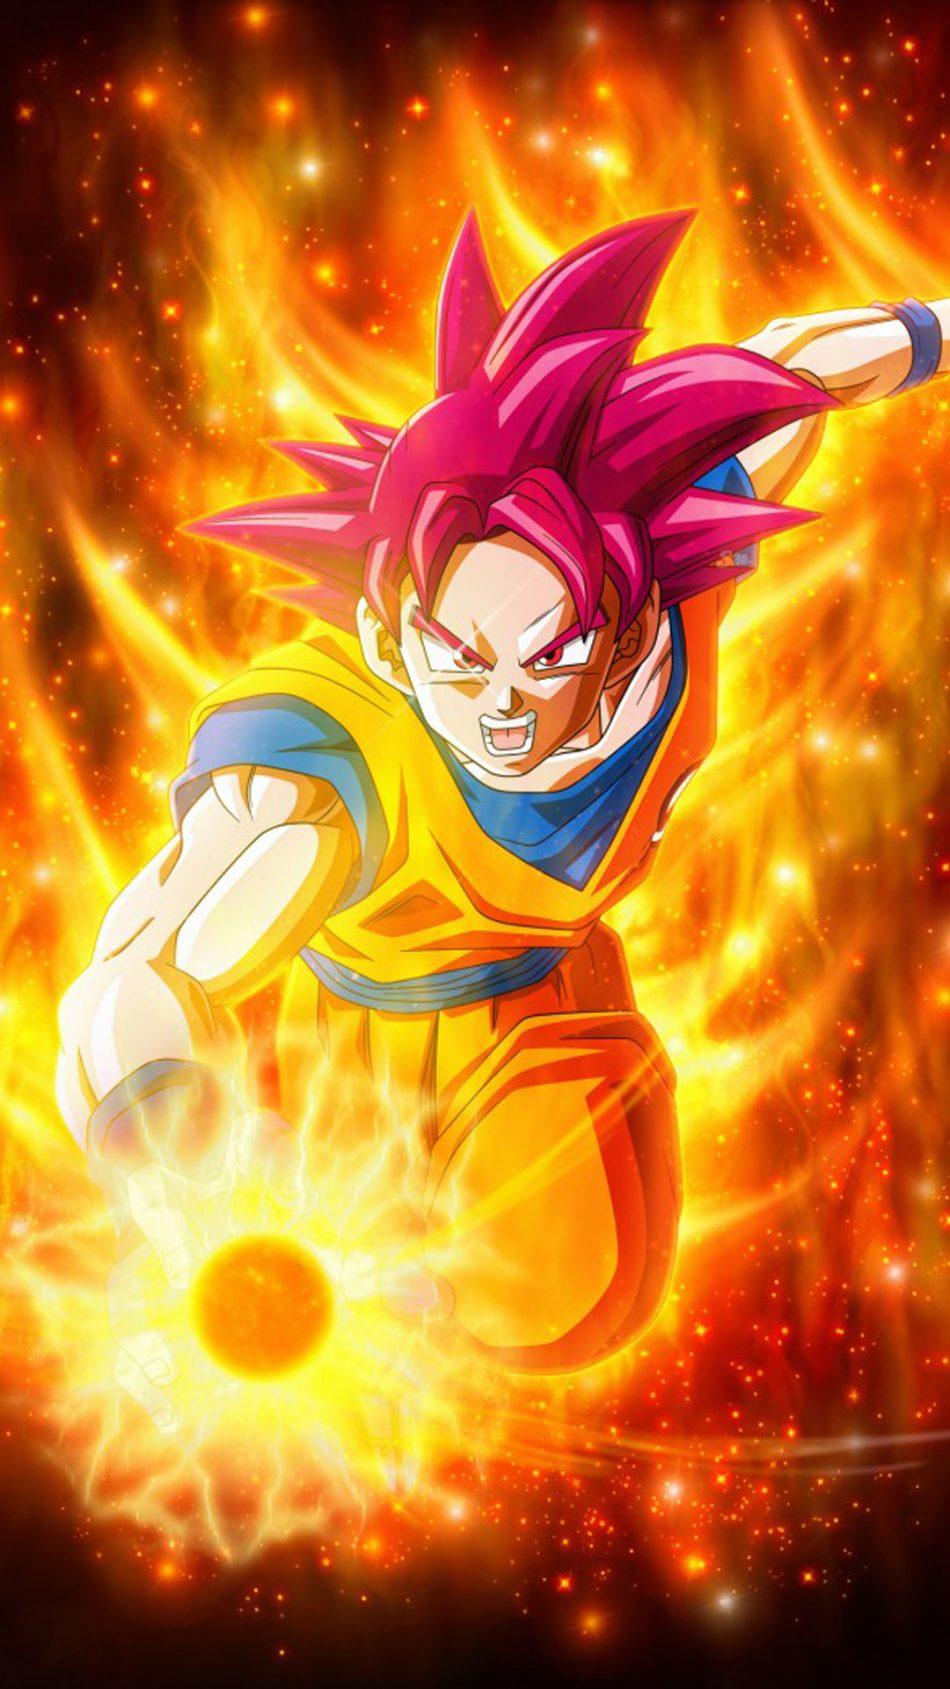 Free Download Download Super Saiyan God In Dragon Ball Super Pure